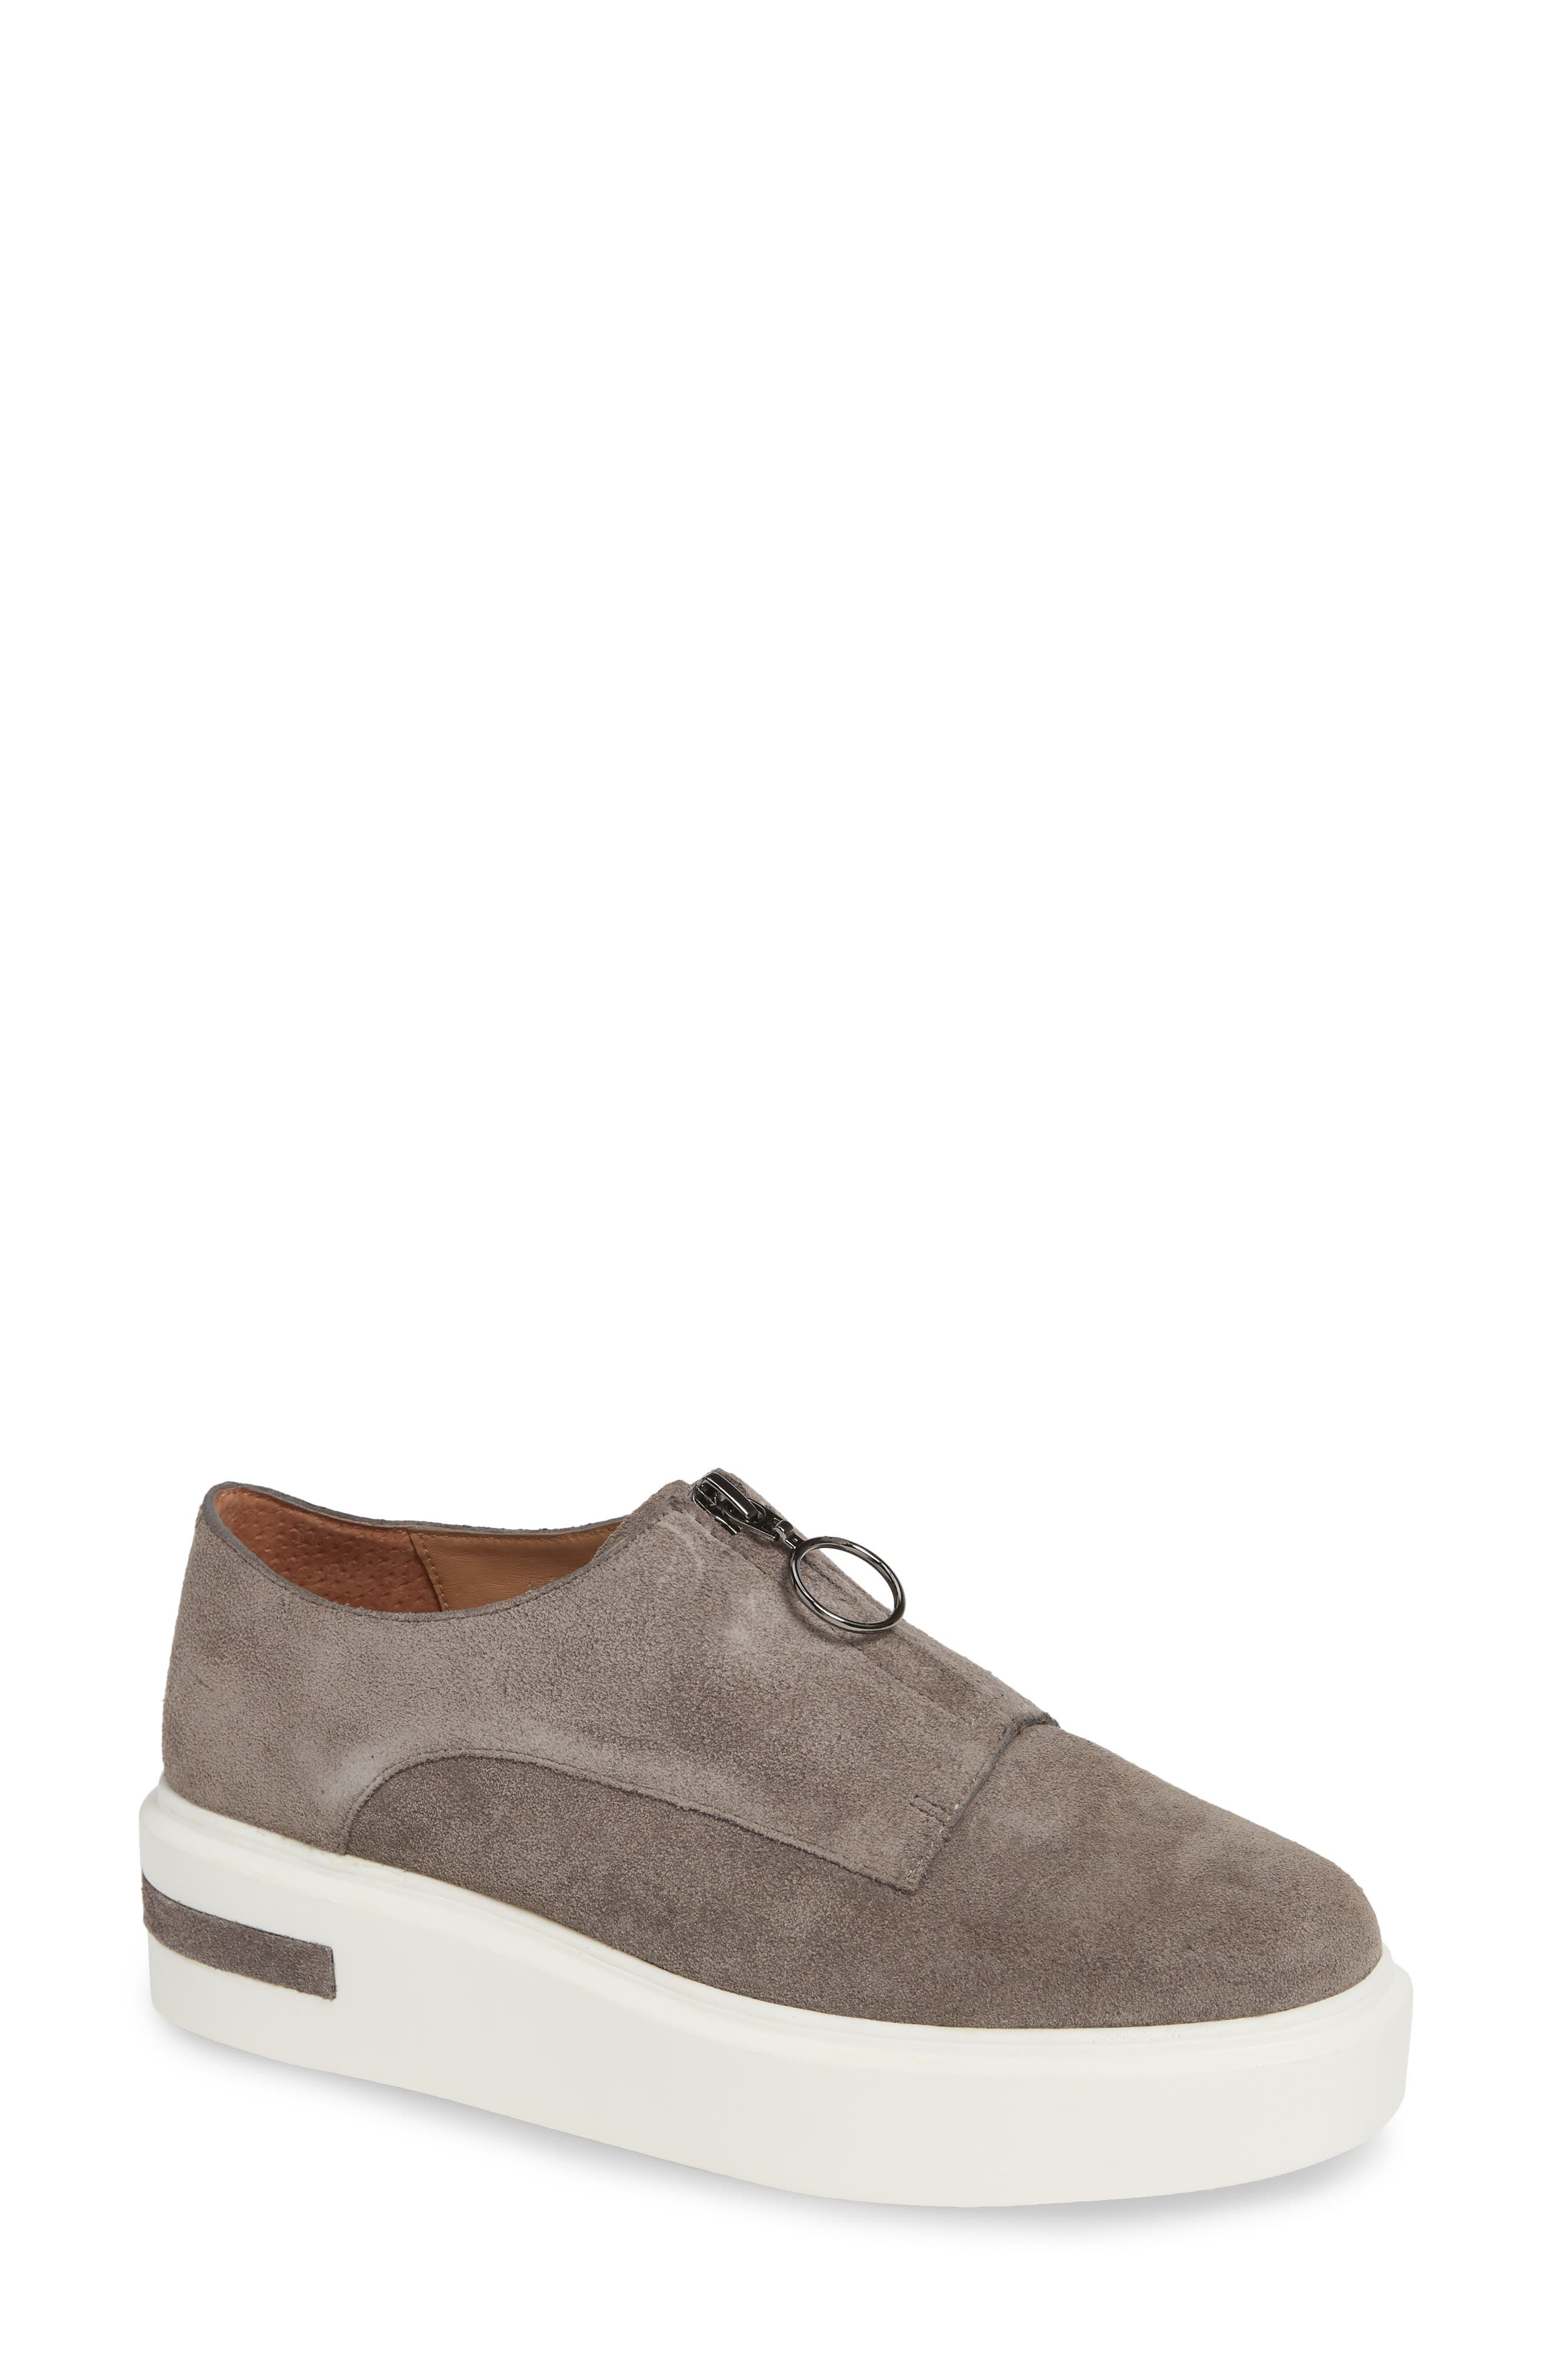 LINEA PAOLO Kelani Platform Sneaker, Main, color, STONE SUEDE